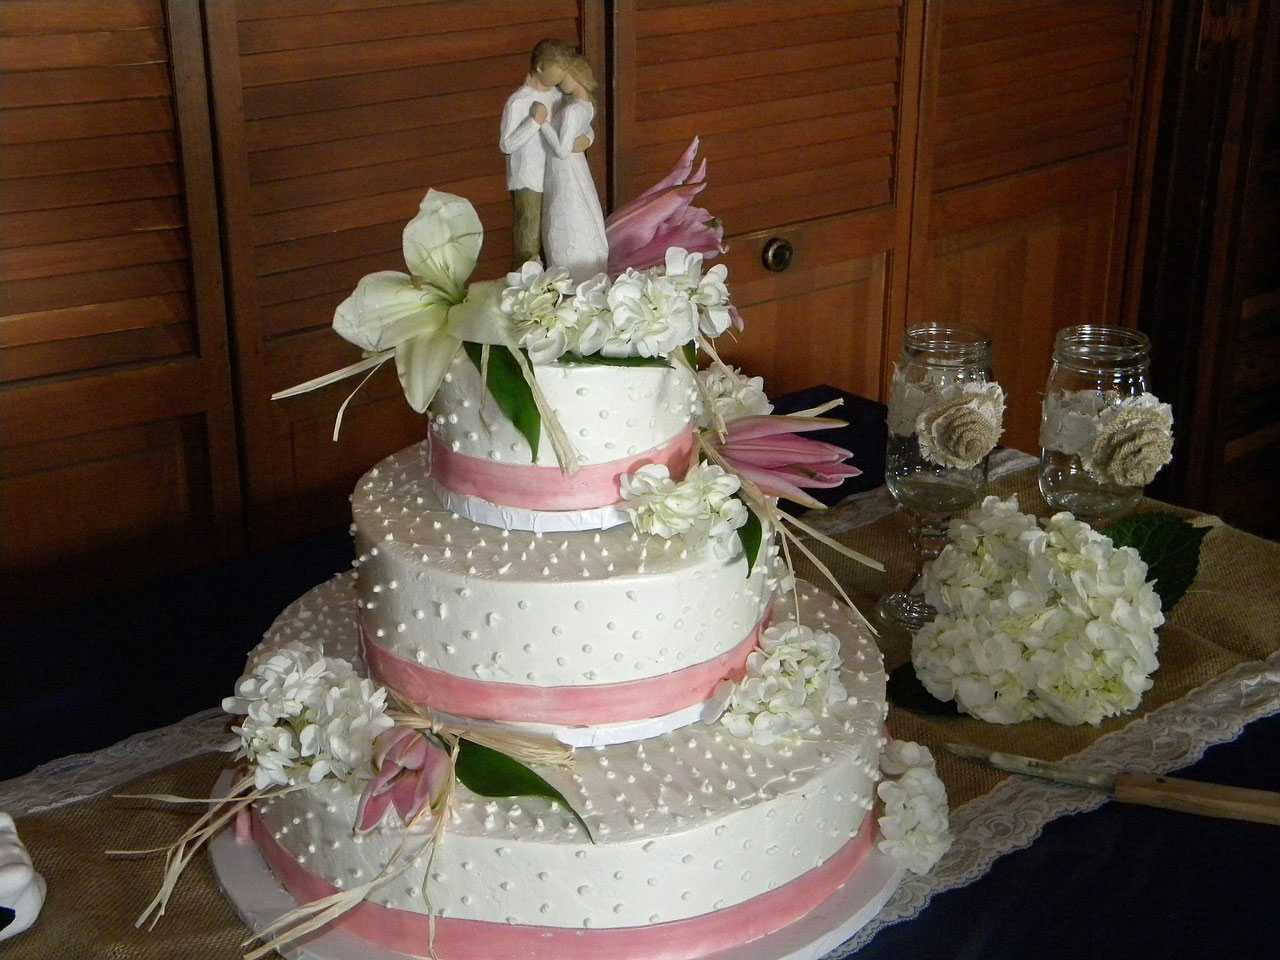 Wedding cakes series of photographs